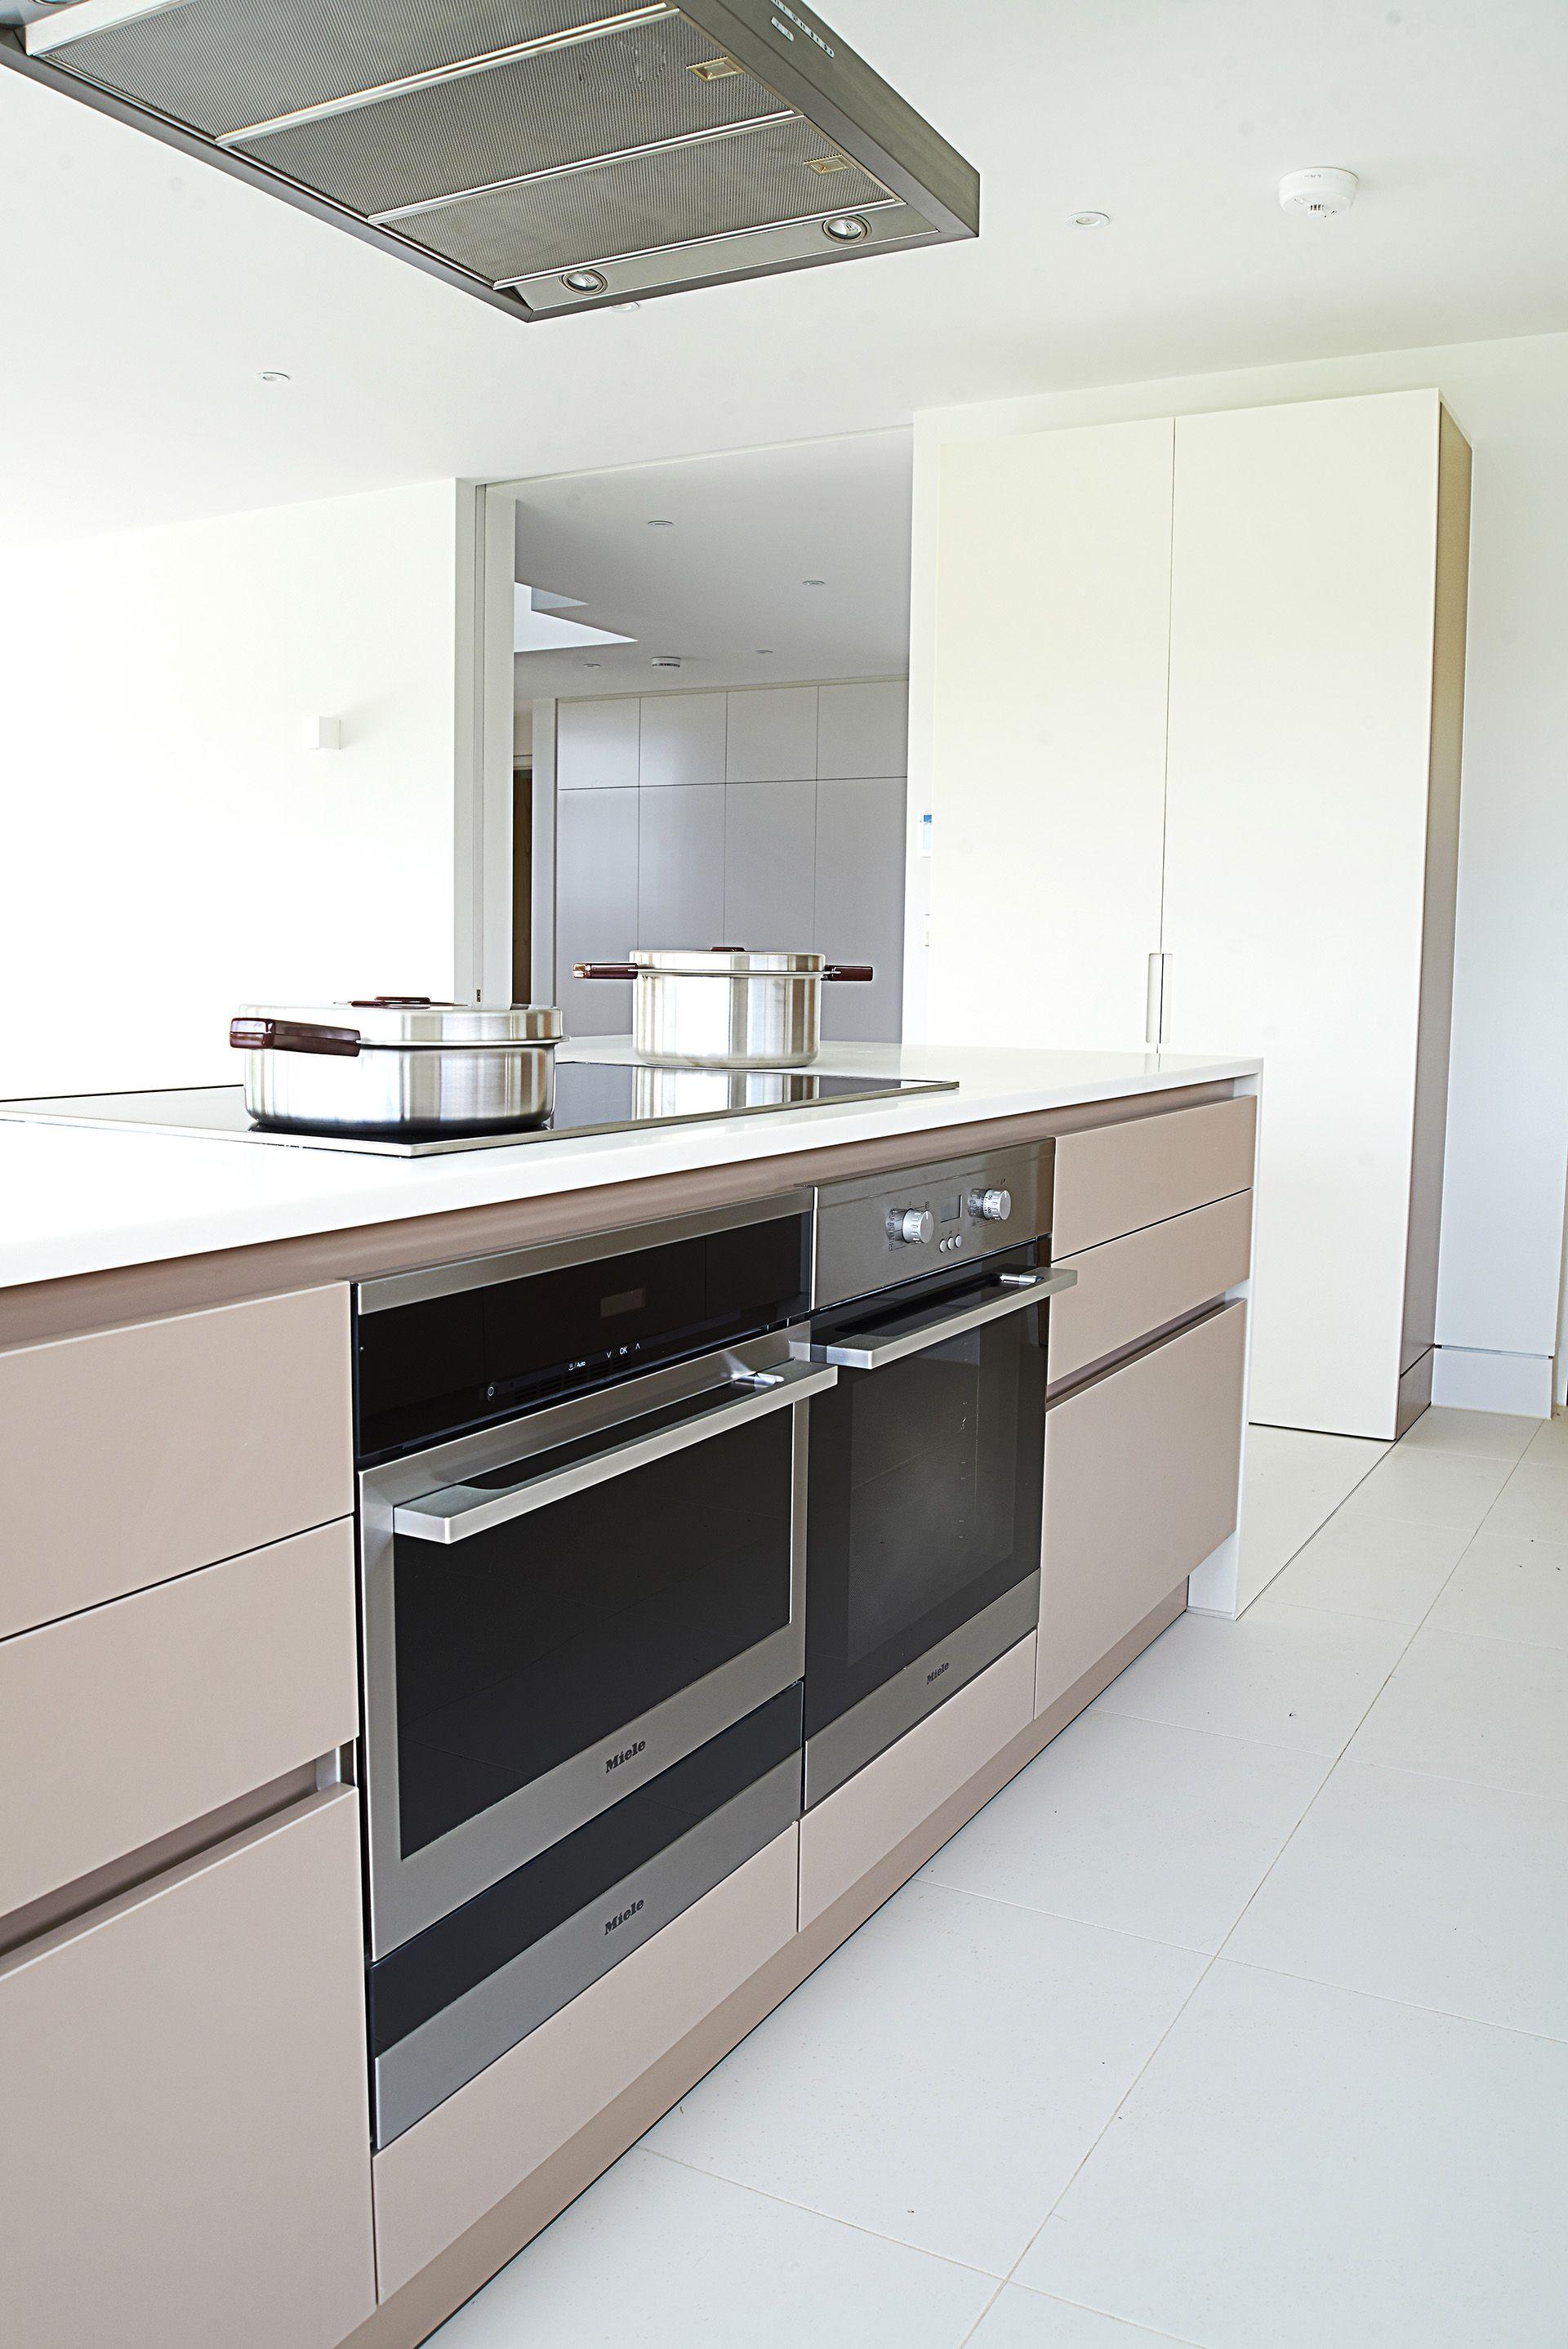 SANTOS kitchen | Cocina con isla diseño Line-E en color Capuccino ...